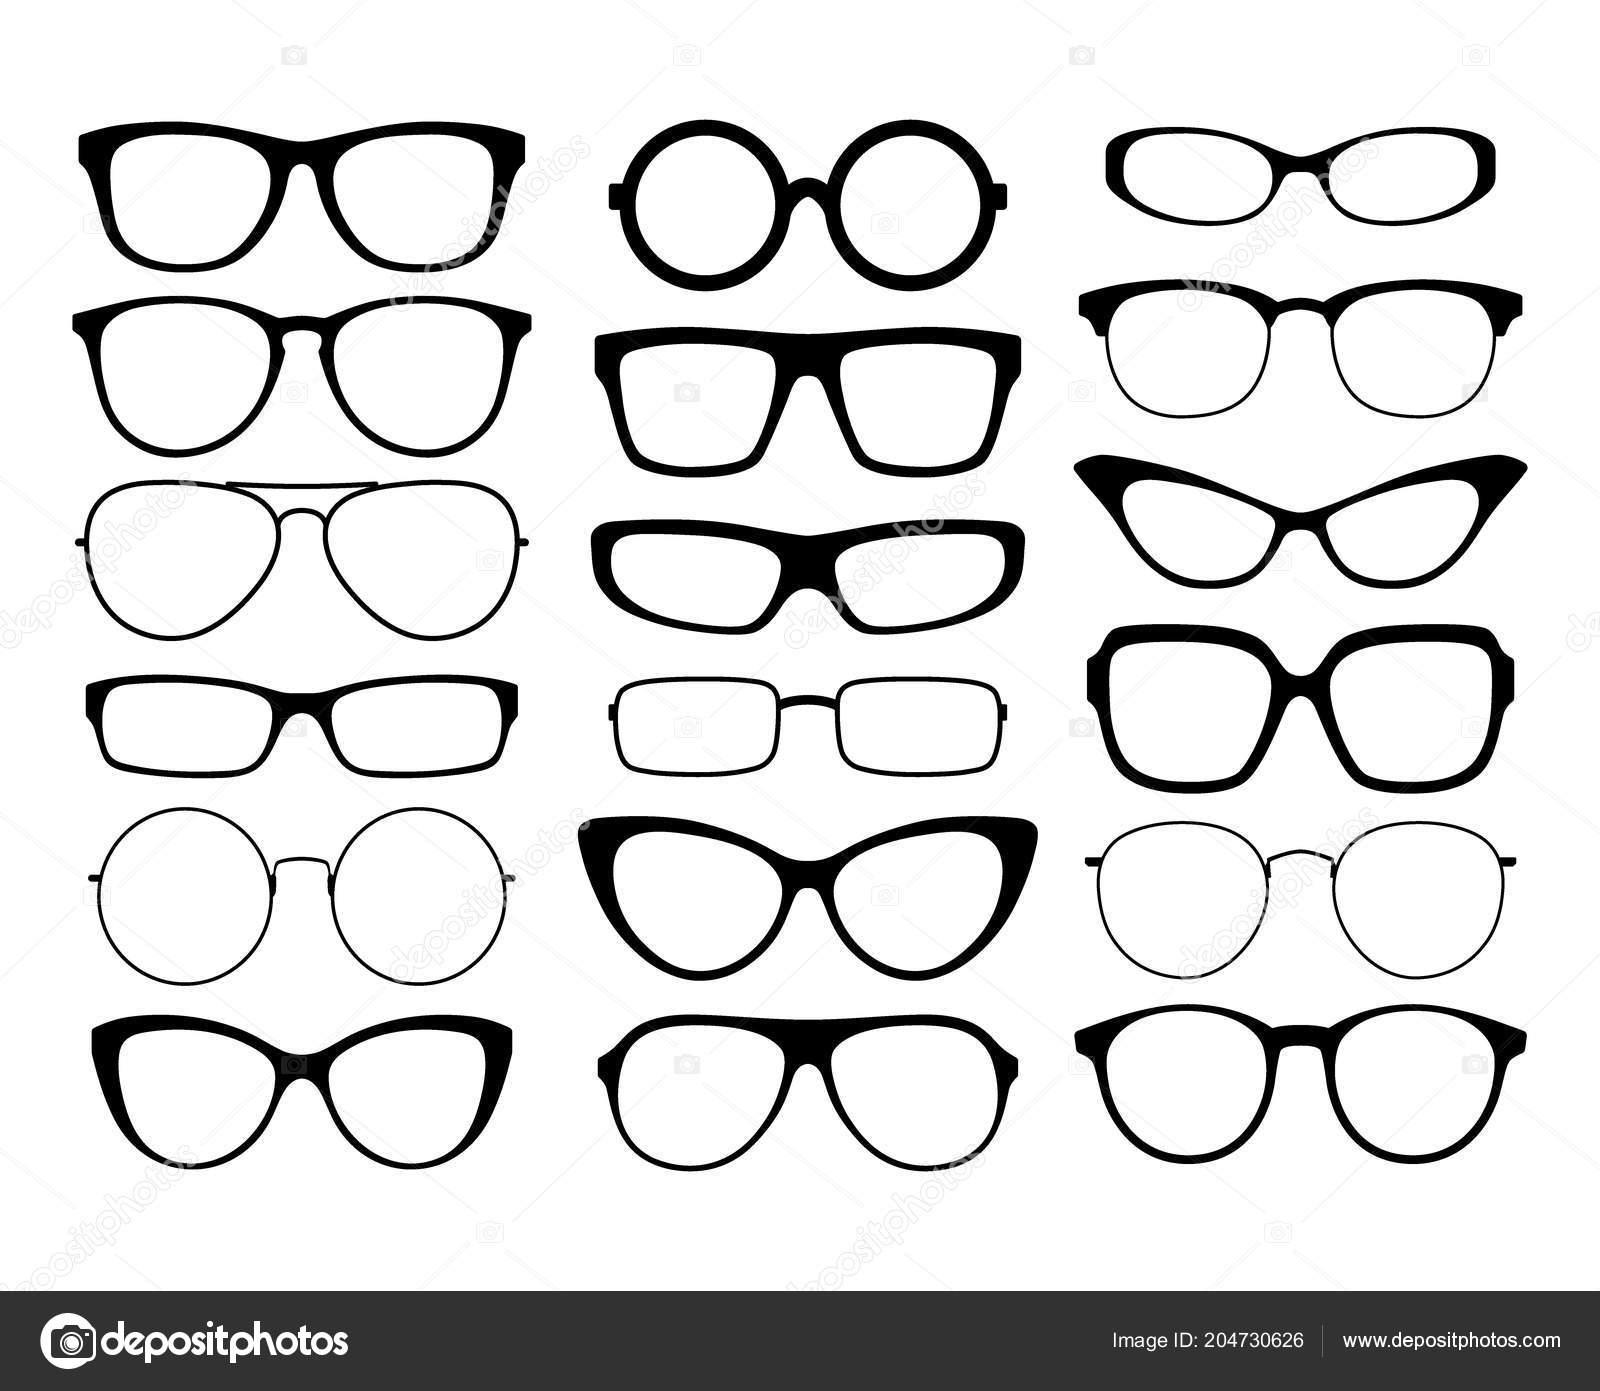 9f02b7aa7ee73 Vários Óculos Silhueta Preta Conjunto Armações Óculos Armações Óculos Sol —  Vetores de Stock